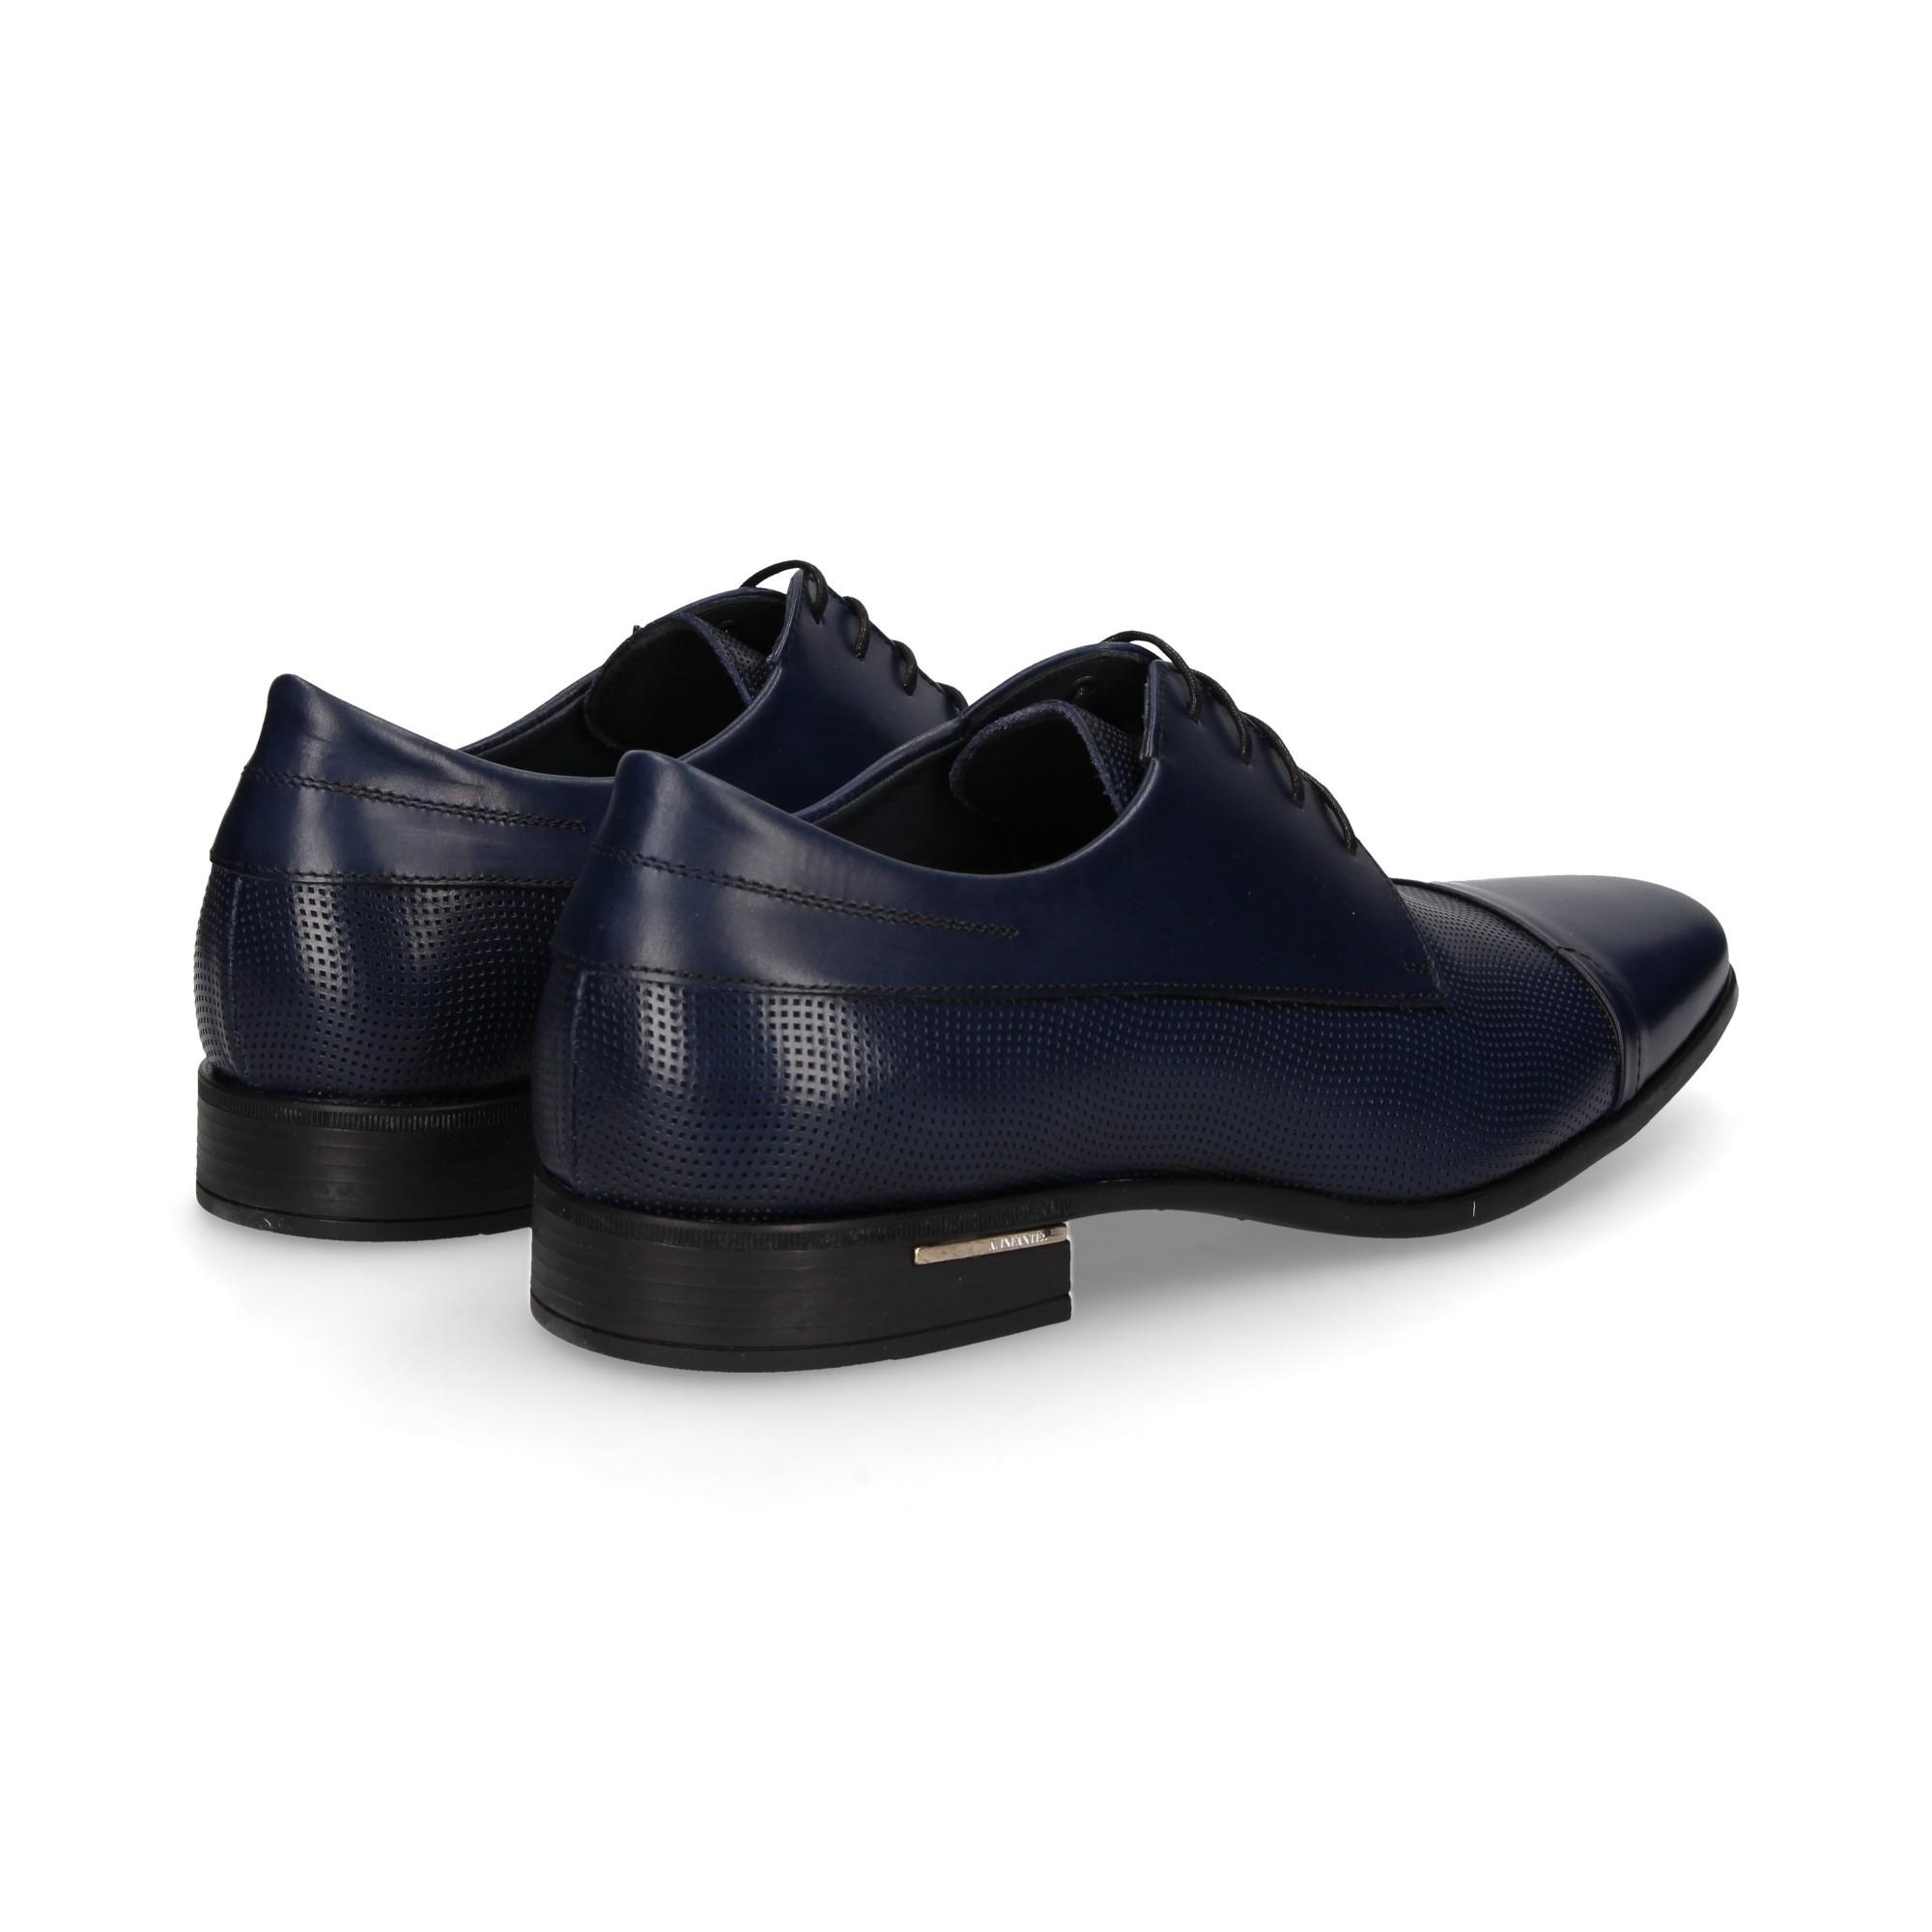 b64a4981abe ANGEL INFANTES Zapatos de vestir de Hombre 05113-1C AZUL